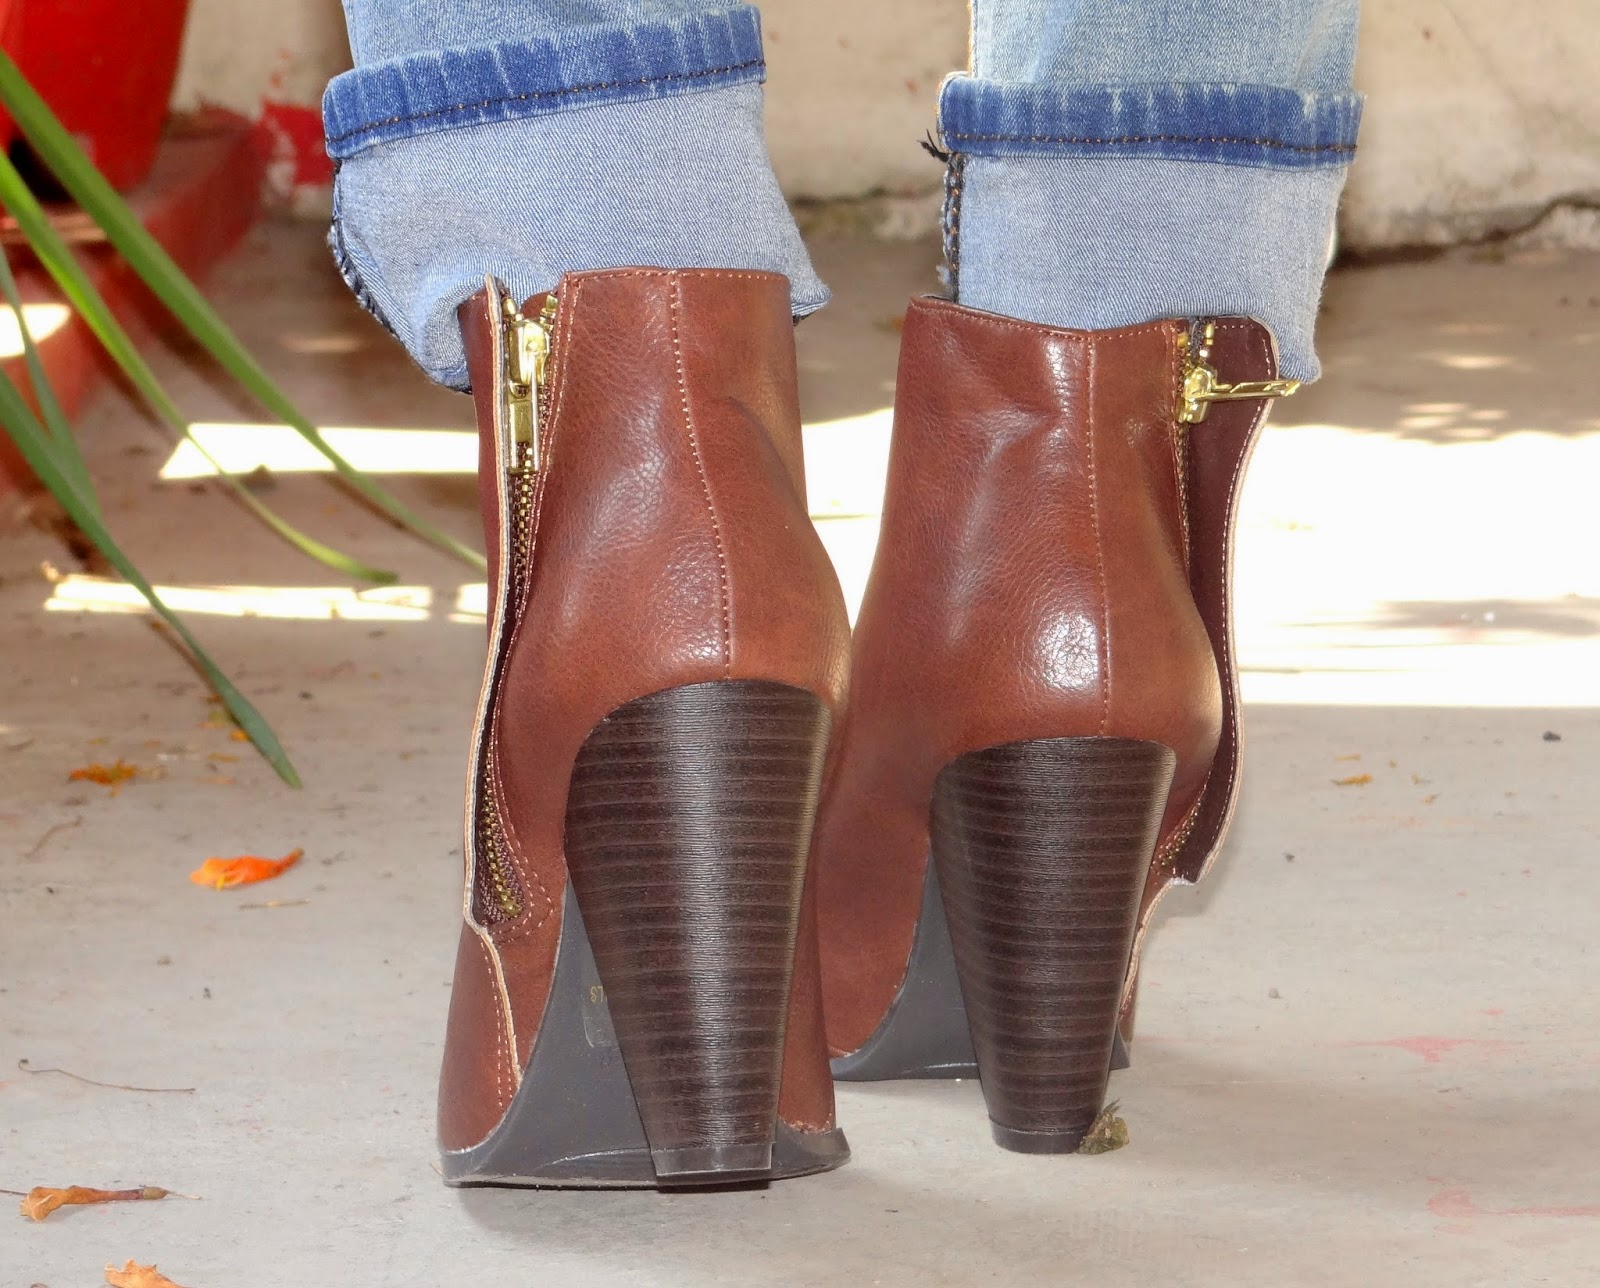 Pinkbasis boots